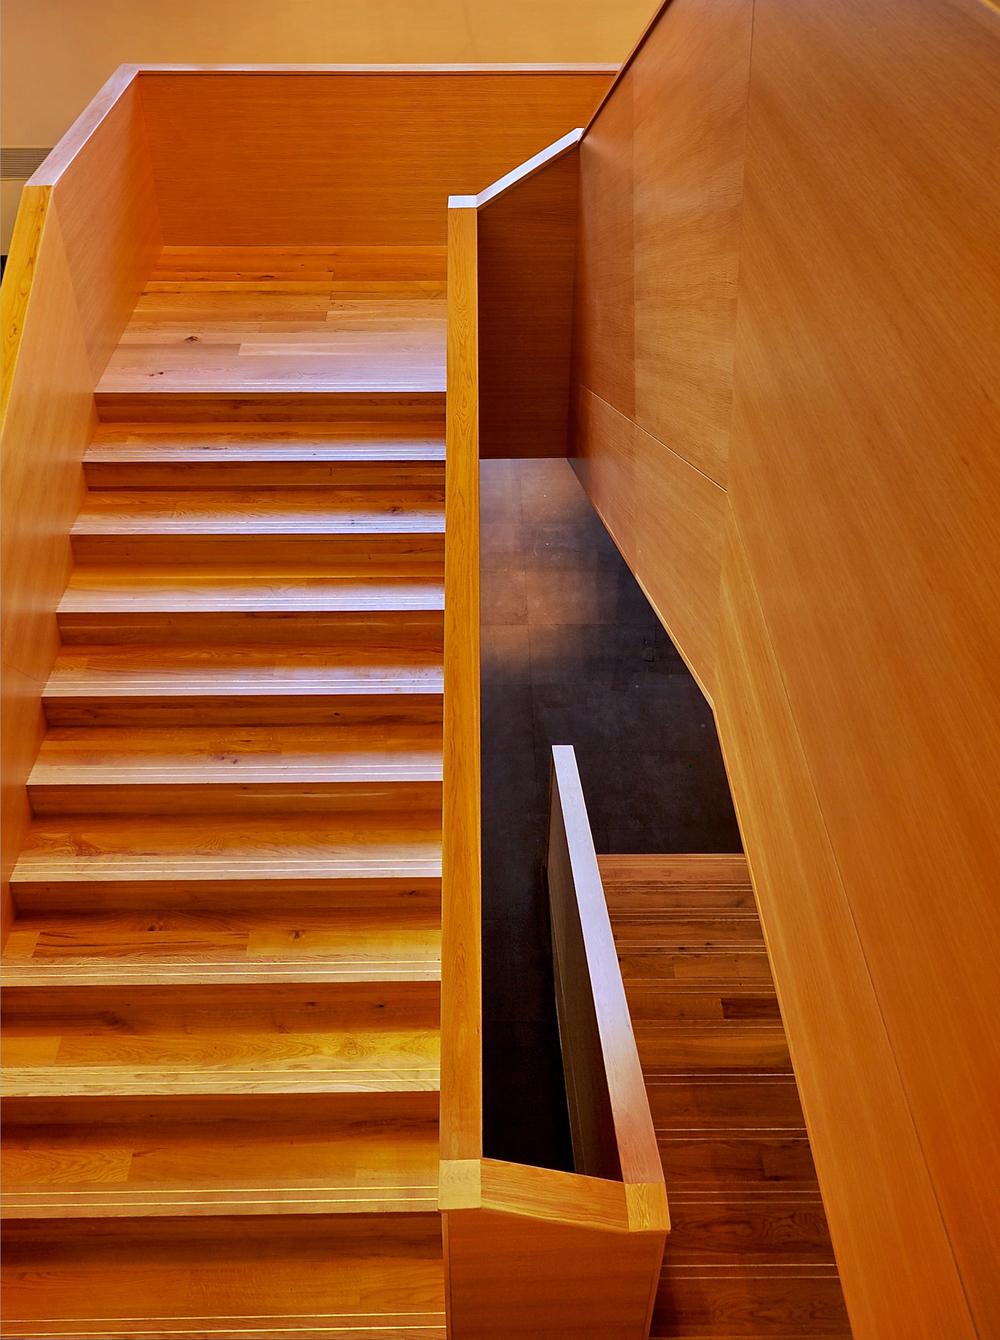 GRAND STAIRCASE 01.jpg